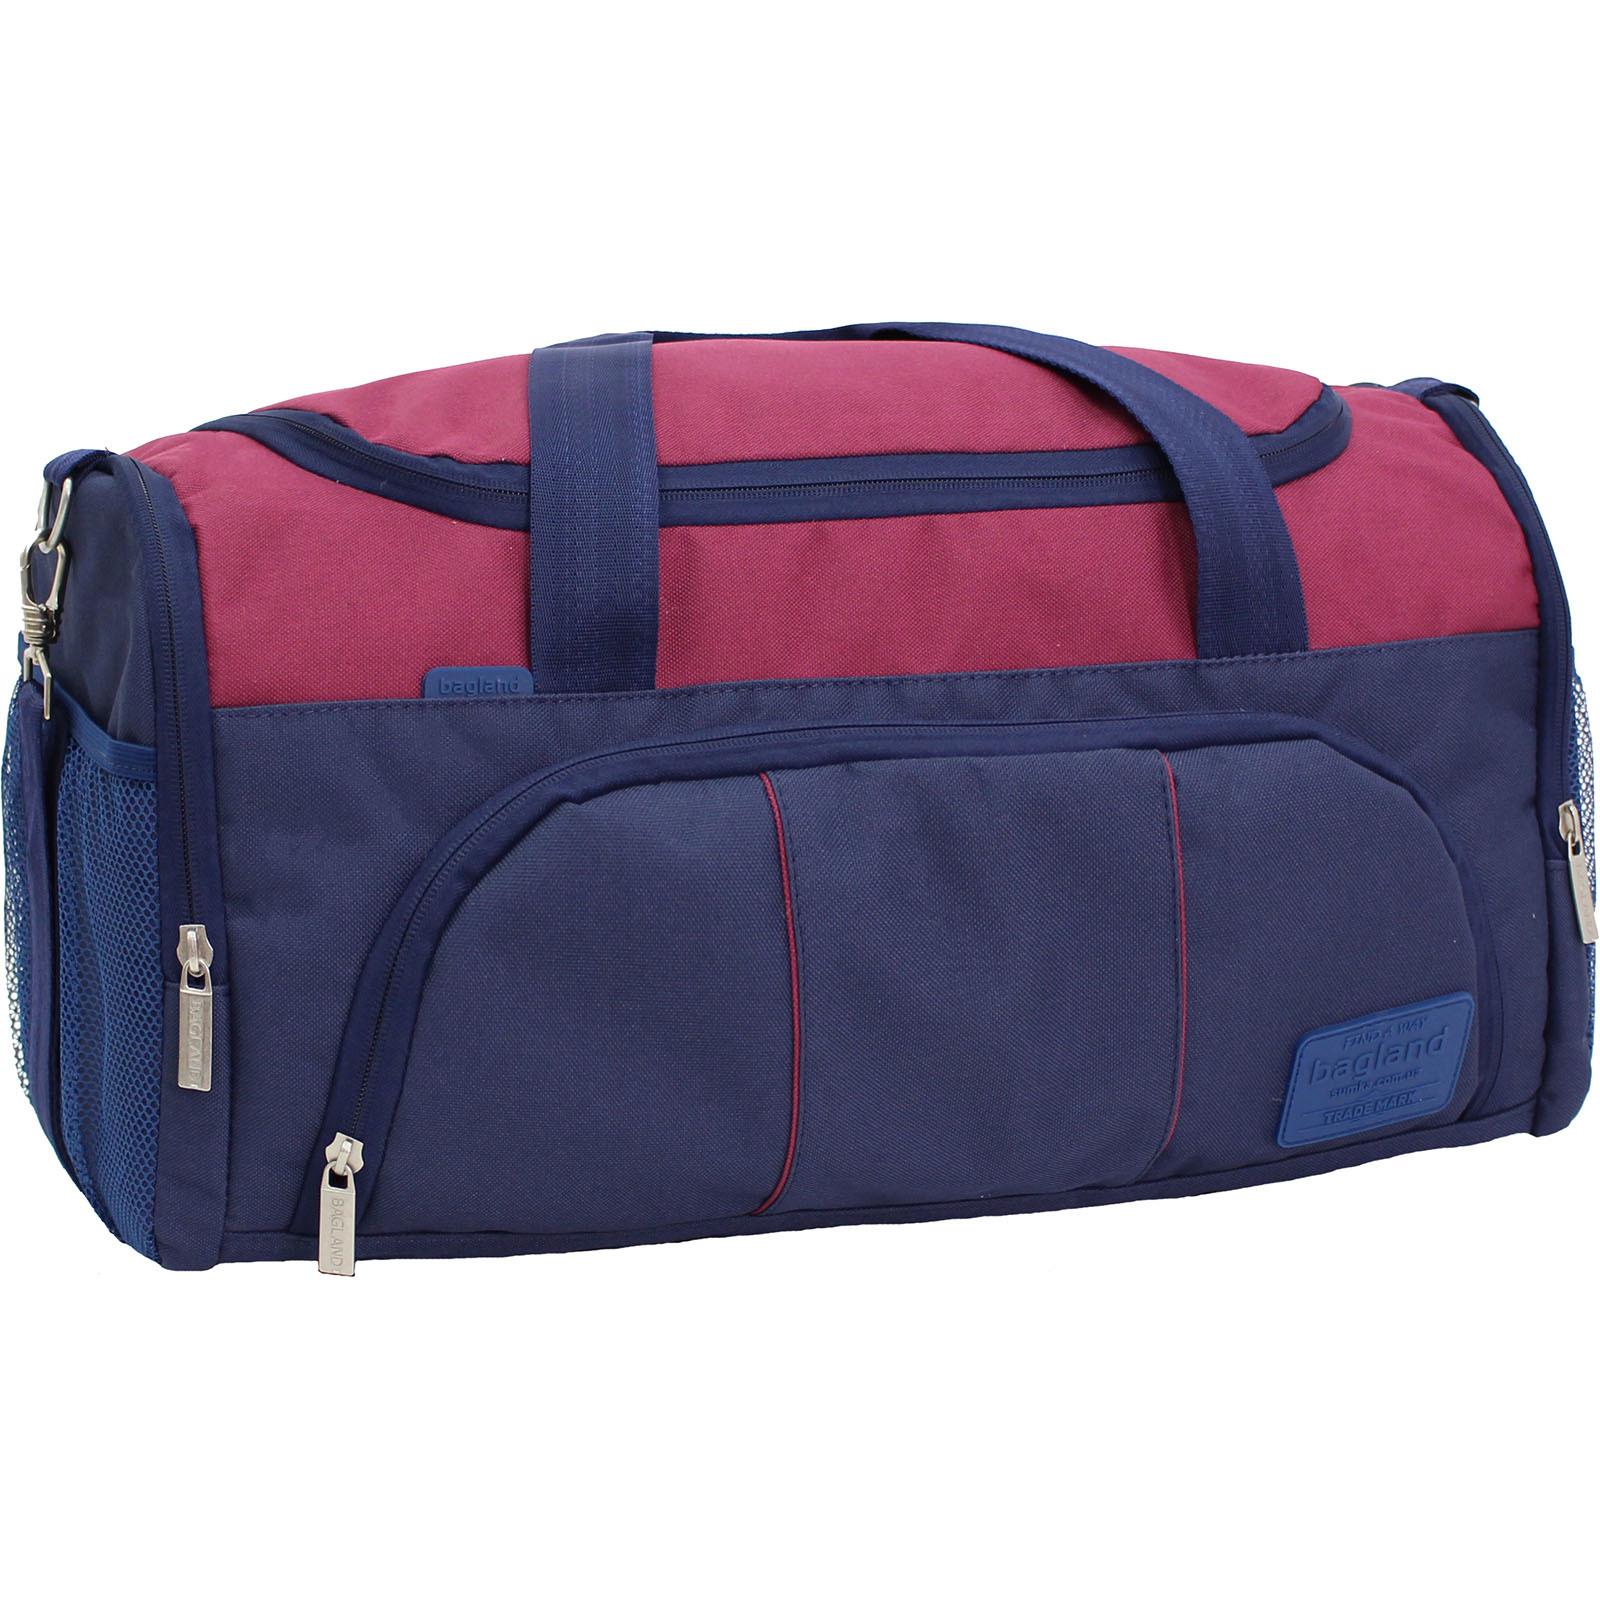 Спортивные сумки Сумка Bagland Bloom 30 л. 330 чорнильний/вишня (0030866) IMG_9605.JPG